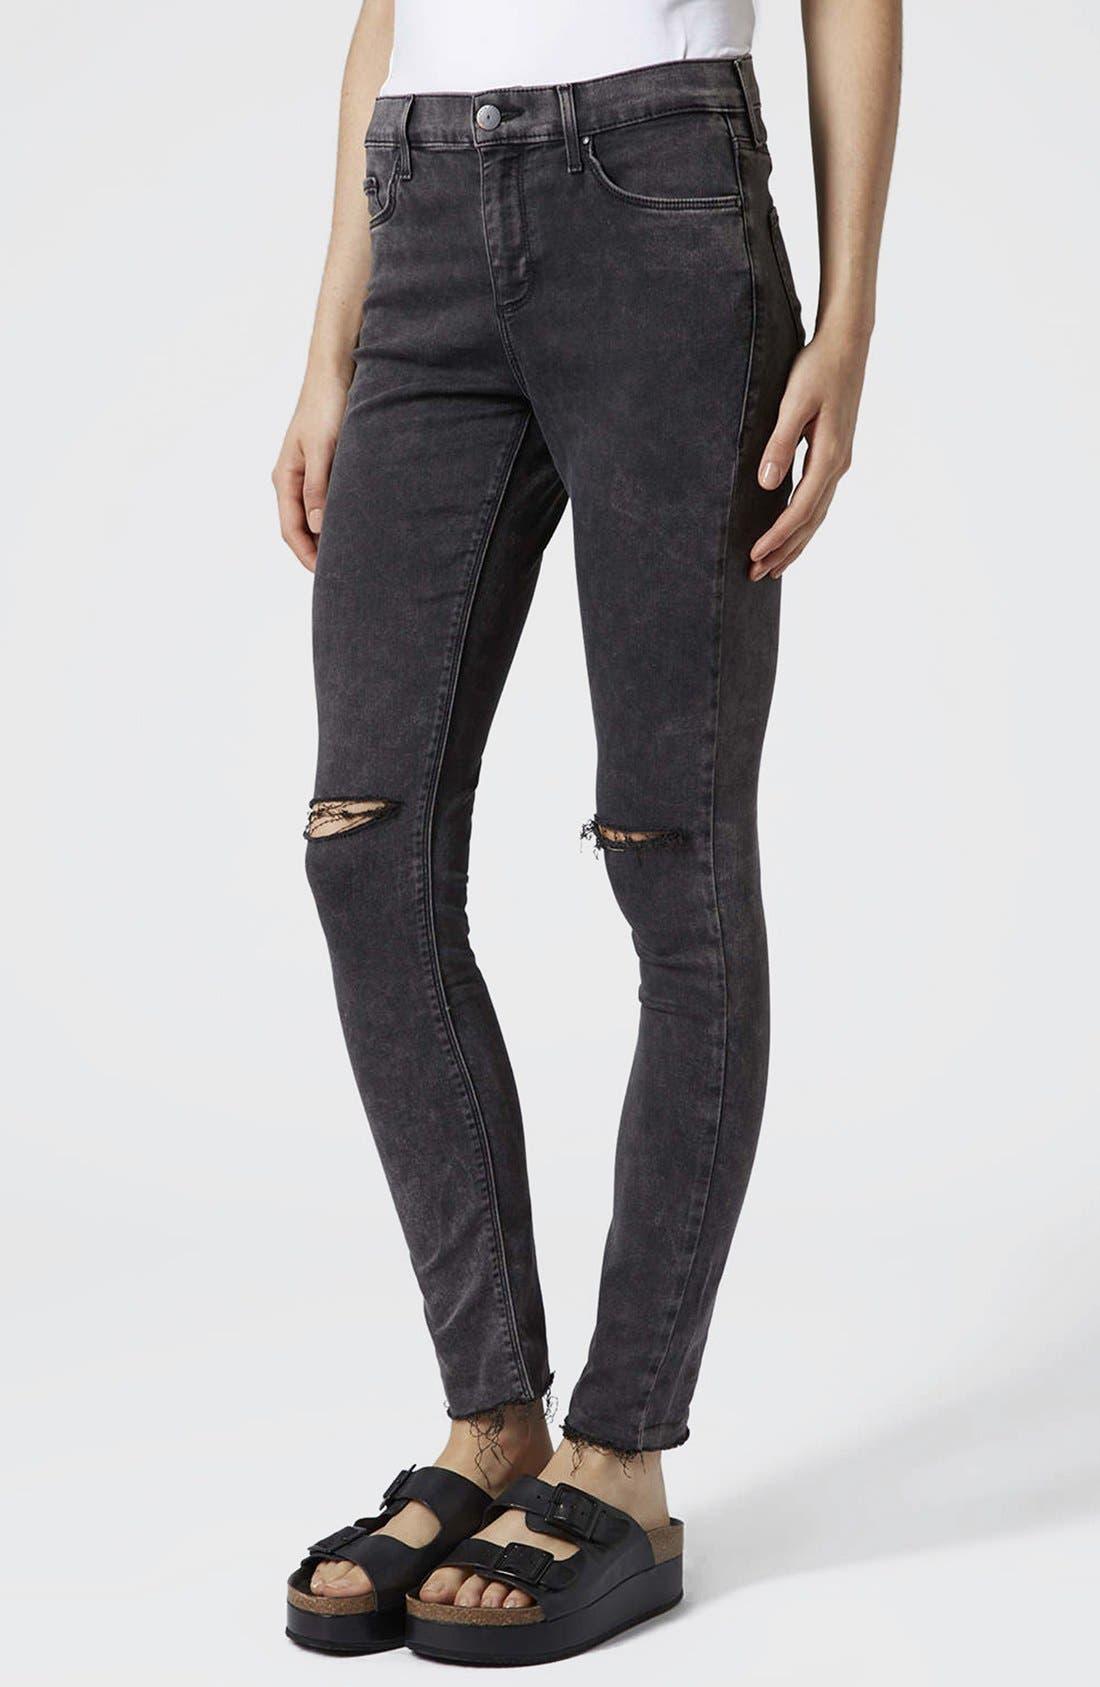 Main Image - Topshop Moto 'Leigh' Distressed Skinny Jeans (Black)